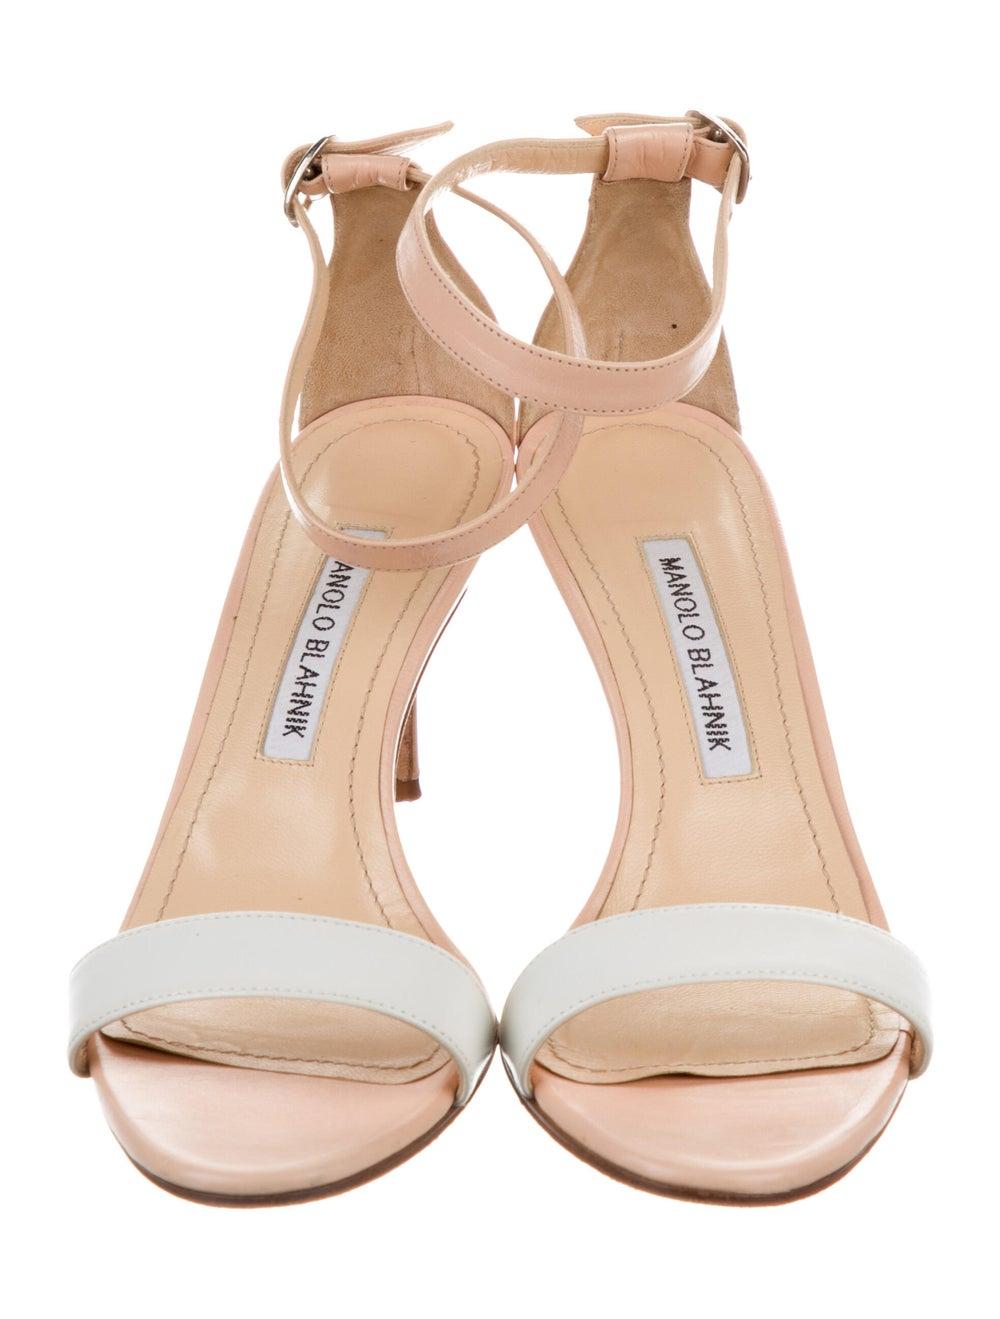 Manolo Blahnik Leather Sandals - image 3